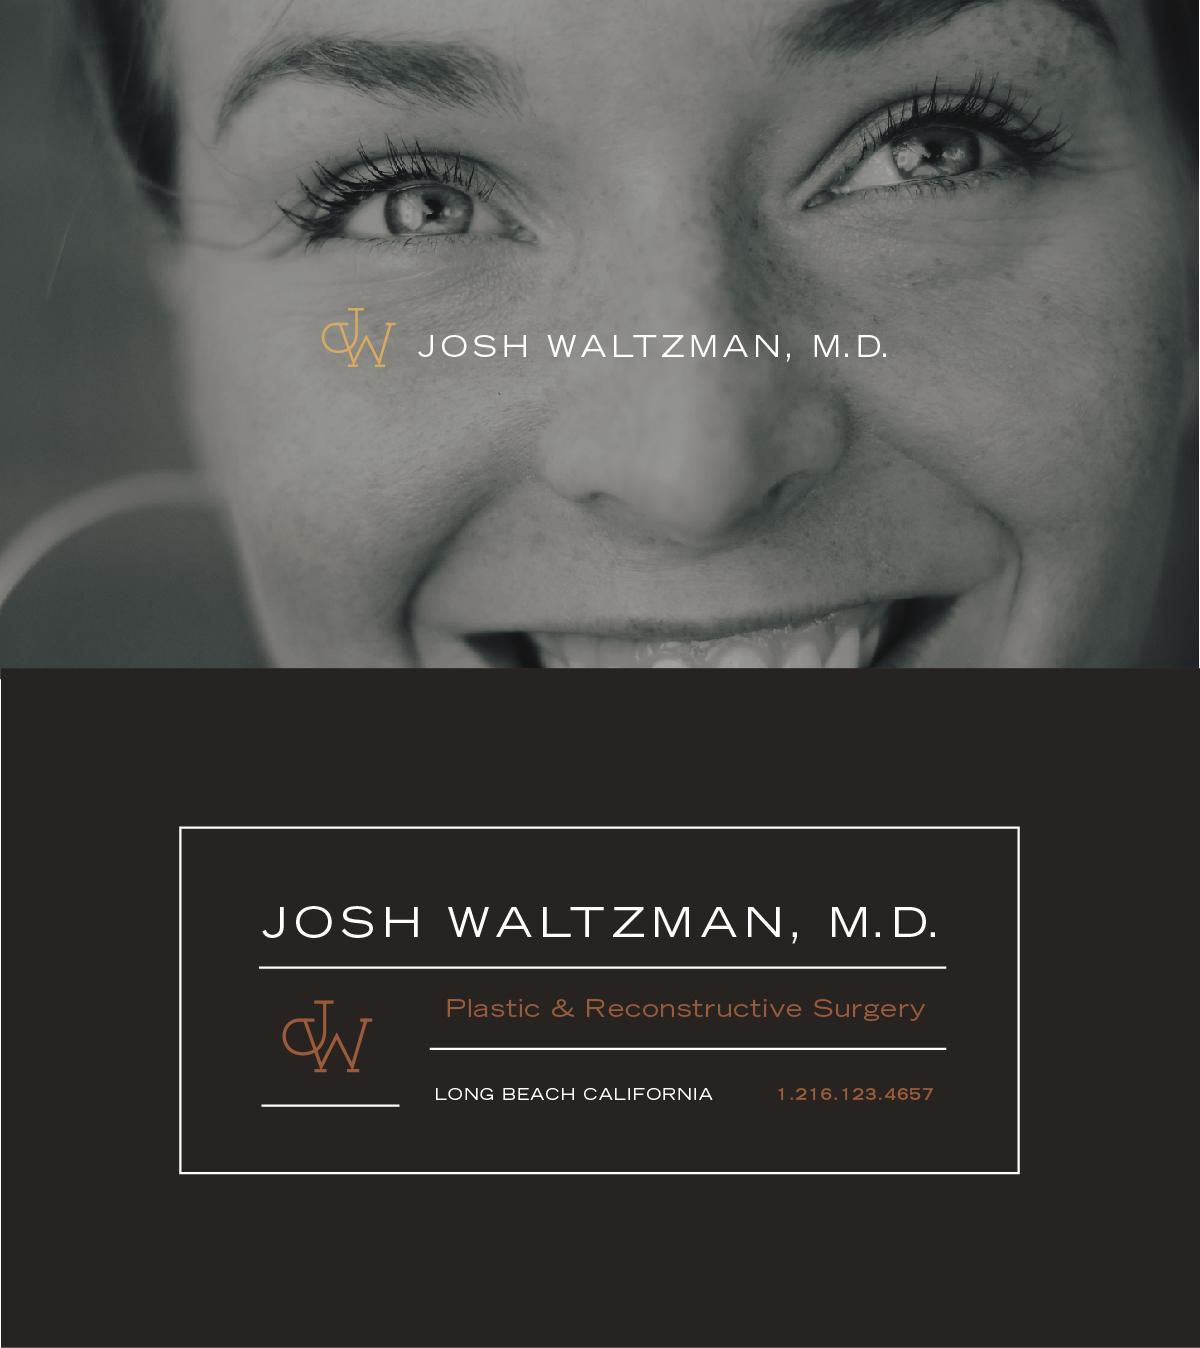 Waltzman-04